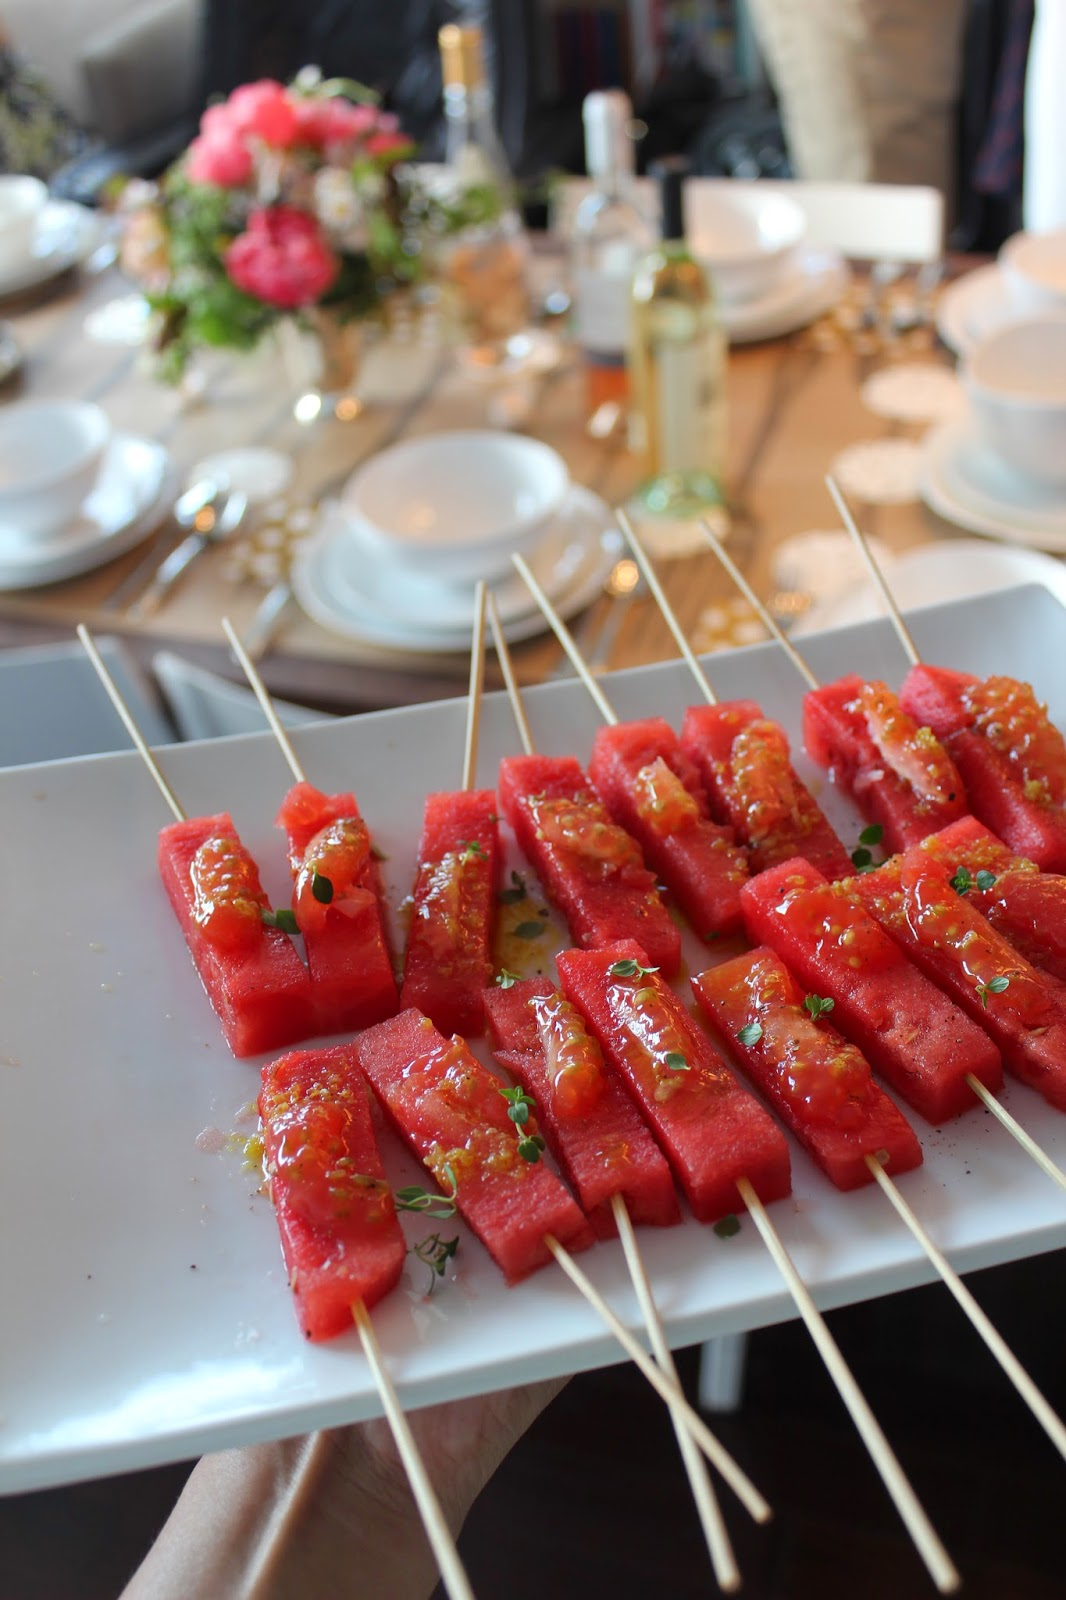 Tomato-Watermelon Skewers // Runaway Apricot